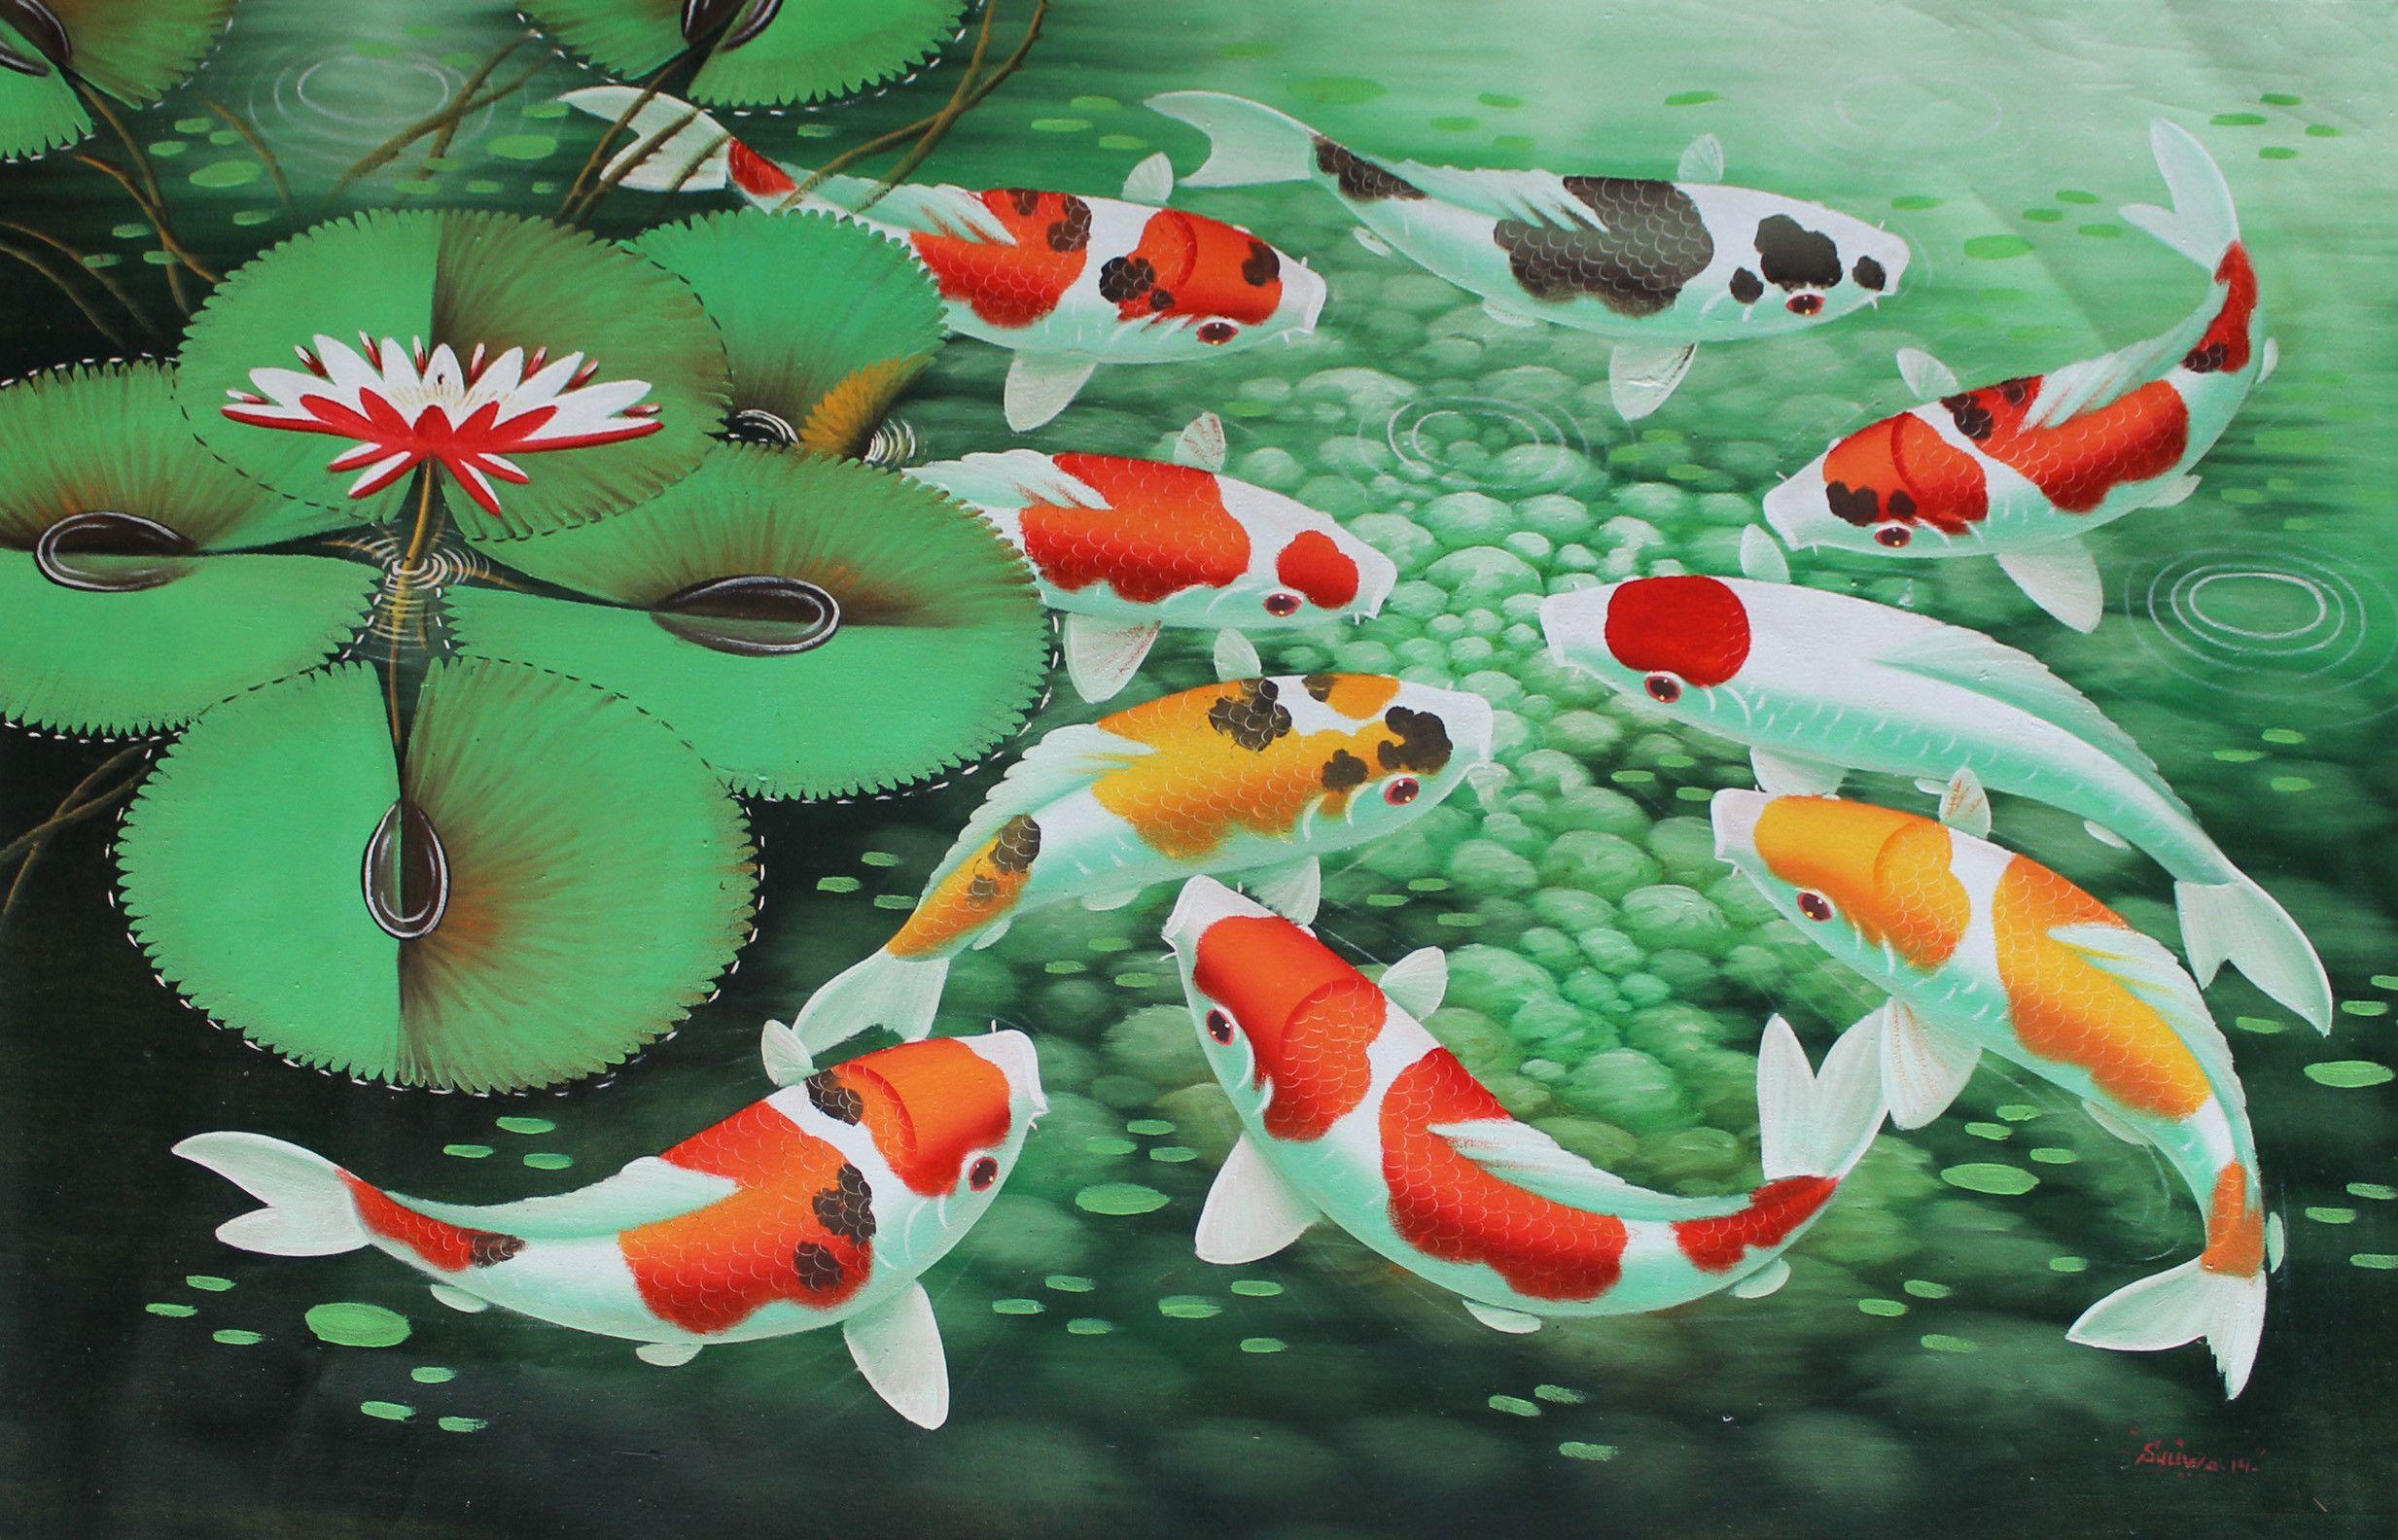 Japanese Koi Fish Art Wallpapers - Top Free Japanese Koi ...